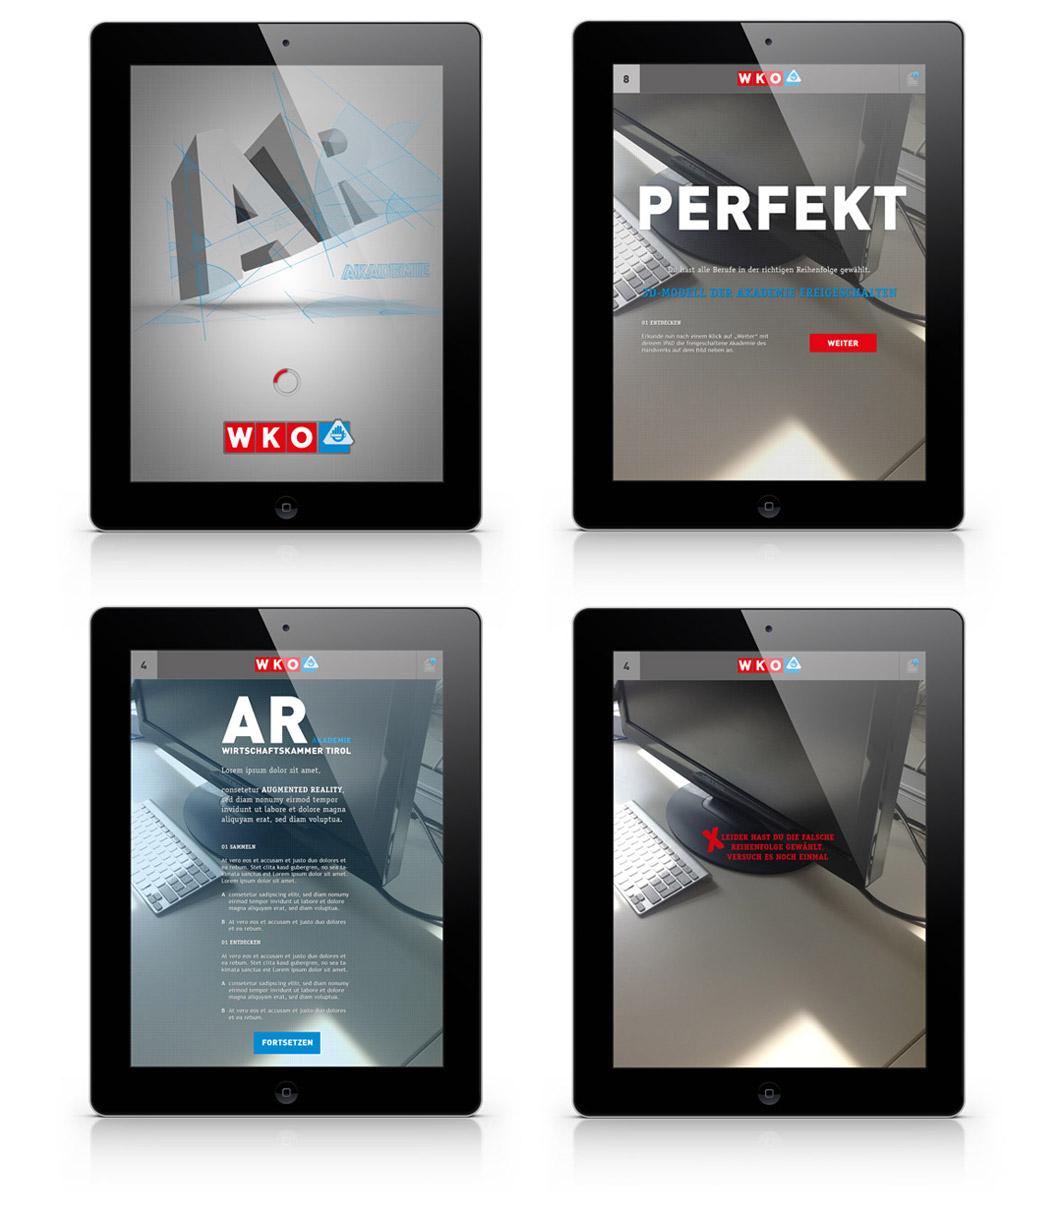 wko_iPadscreens